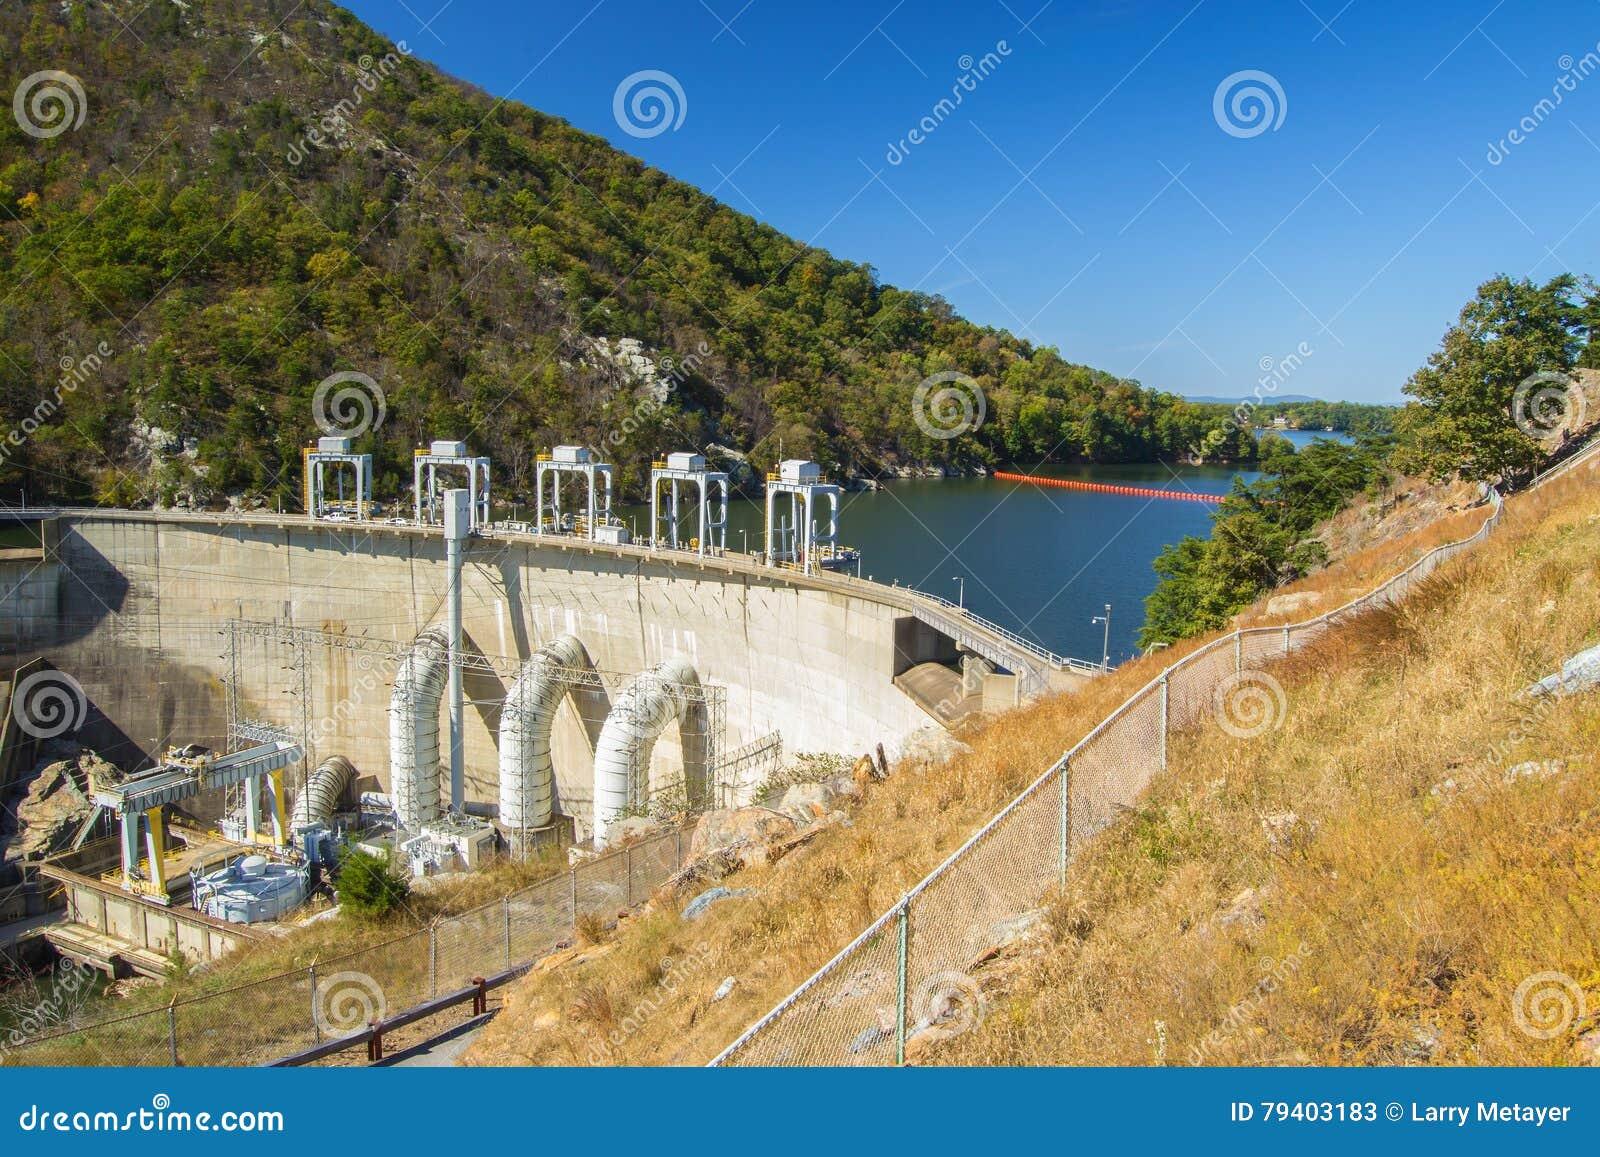 Smith Mountain Dam, Penhook, VA, USA